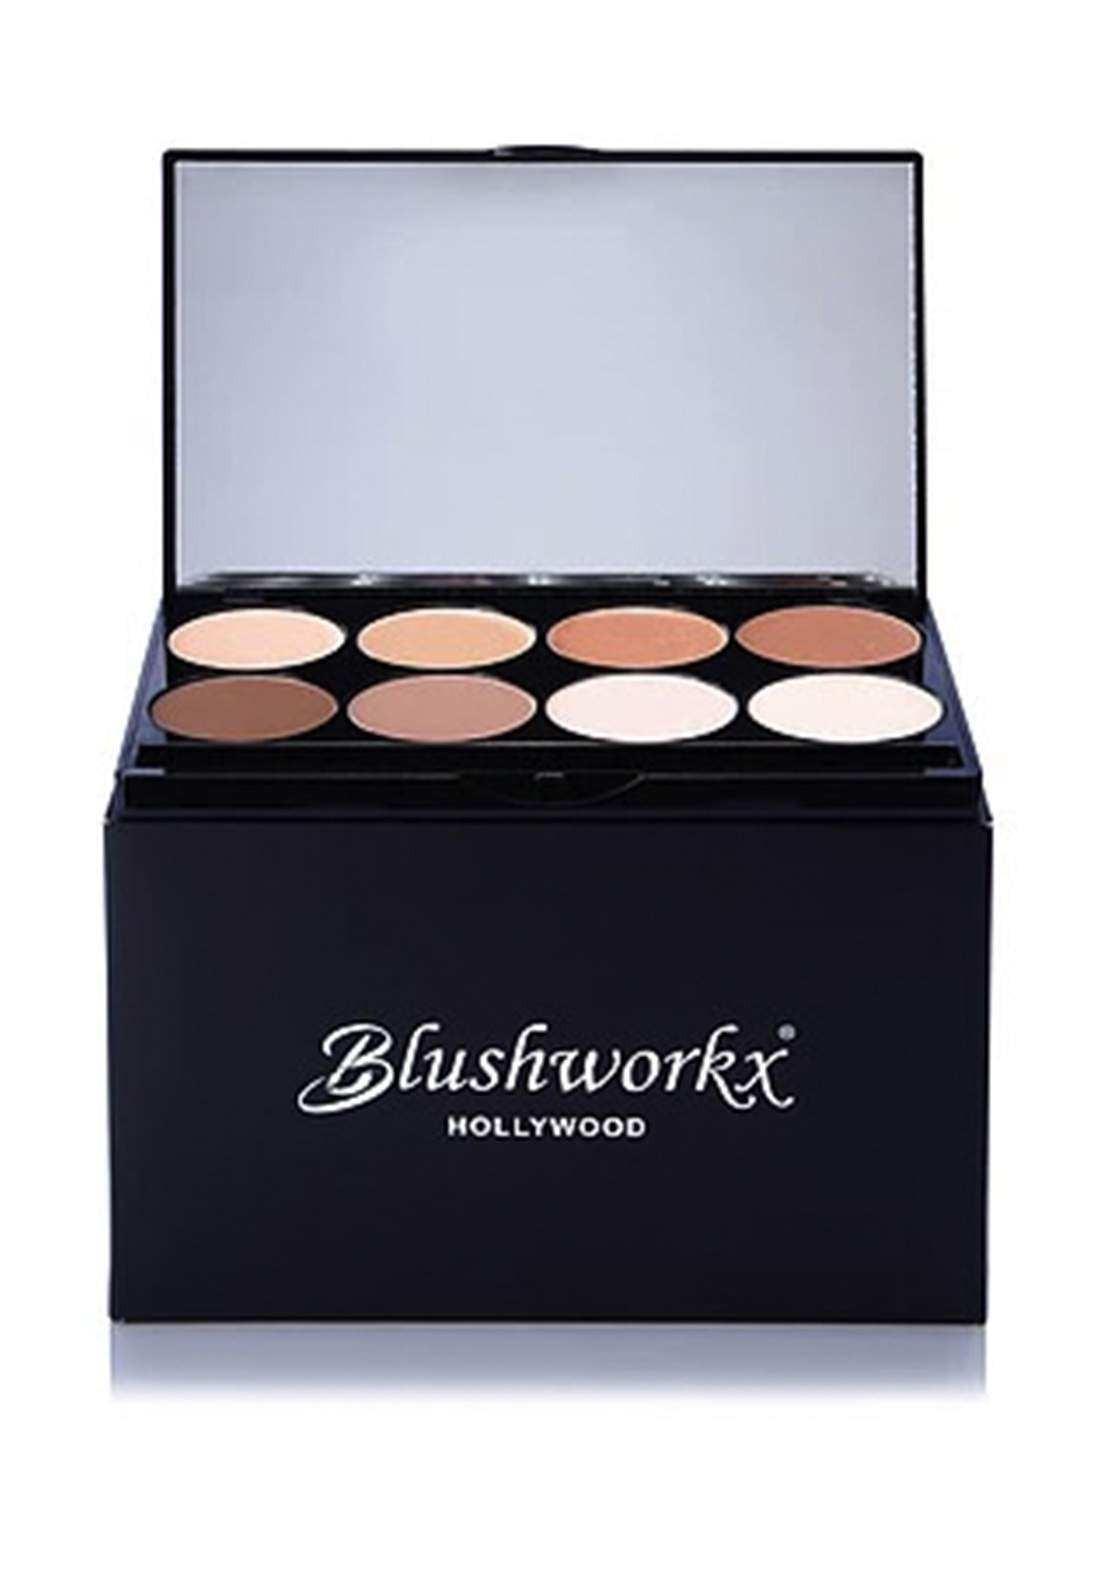 Blushworkx Hollywood Ultimate Contour 8Pcs Kit باليت كونتور